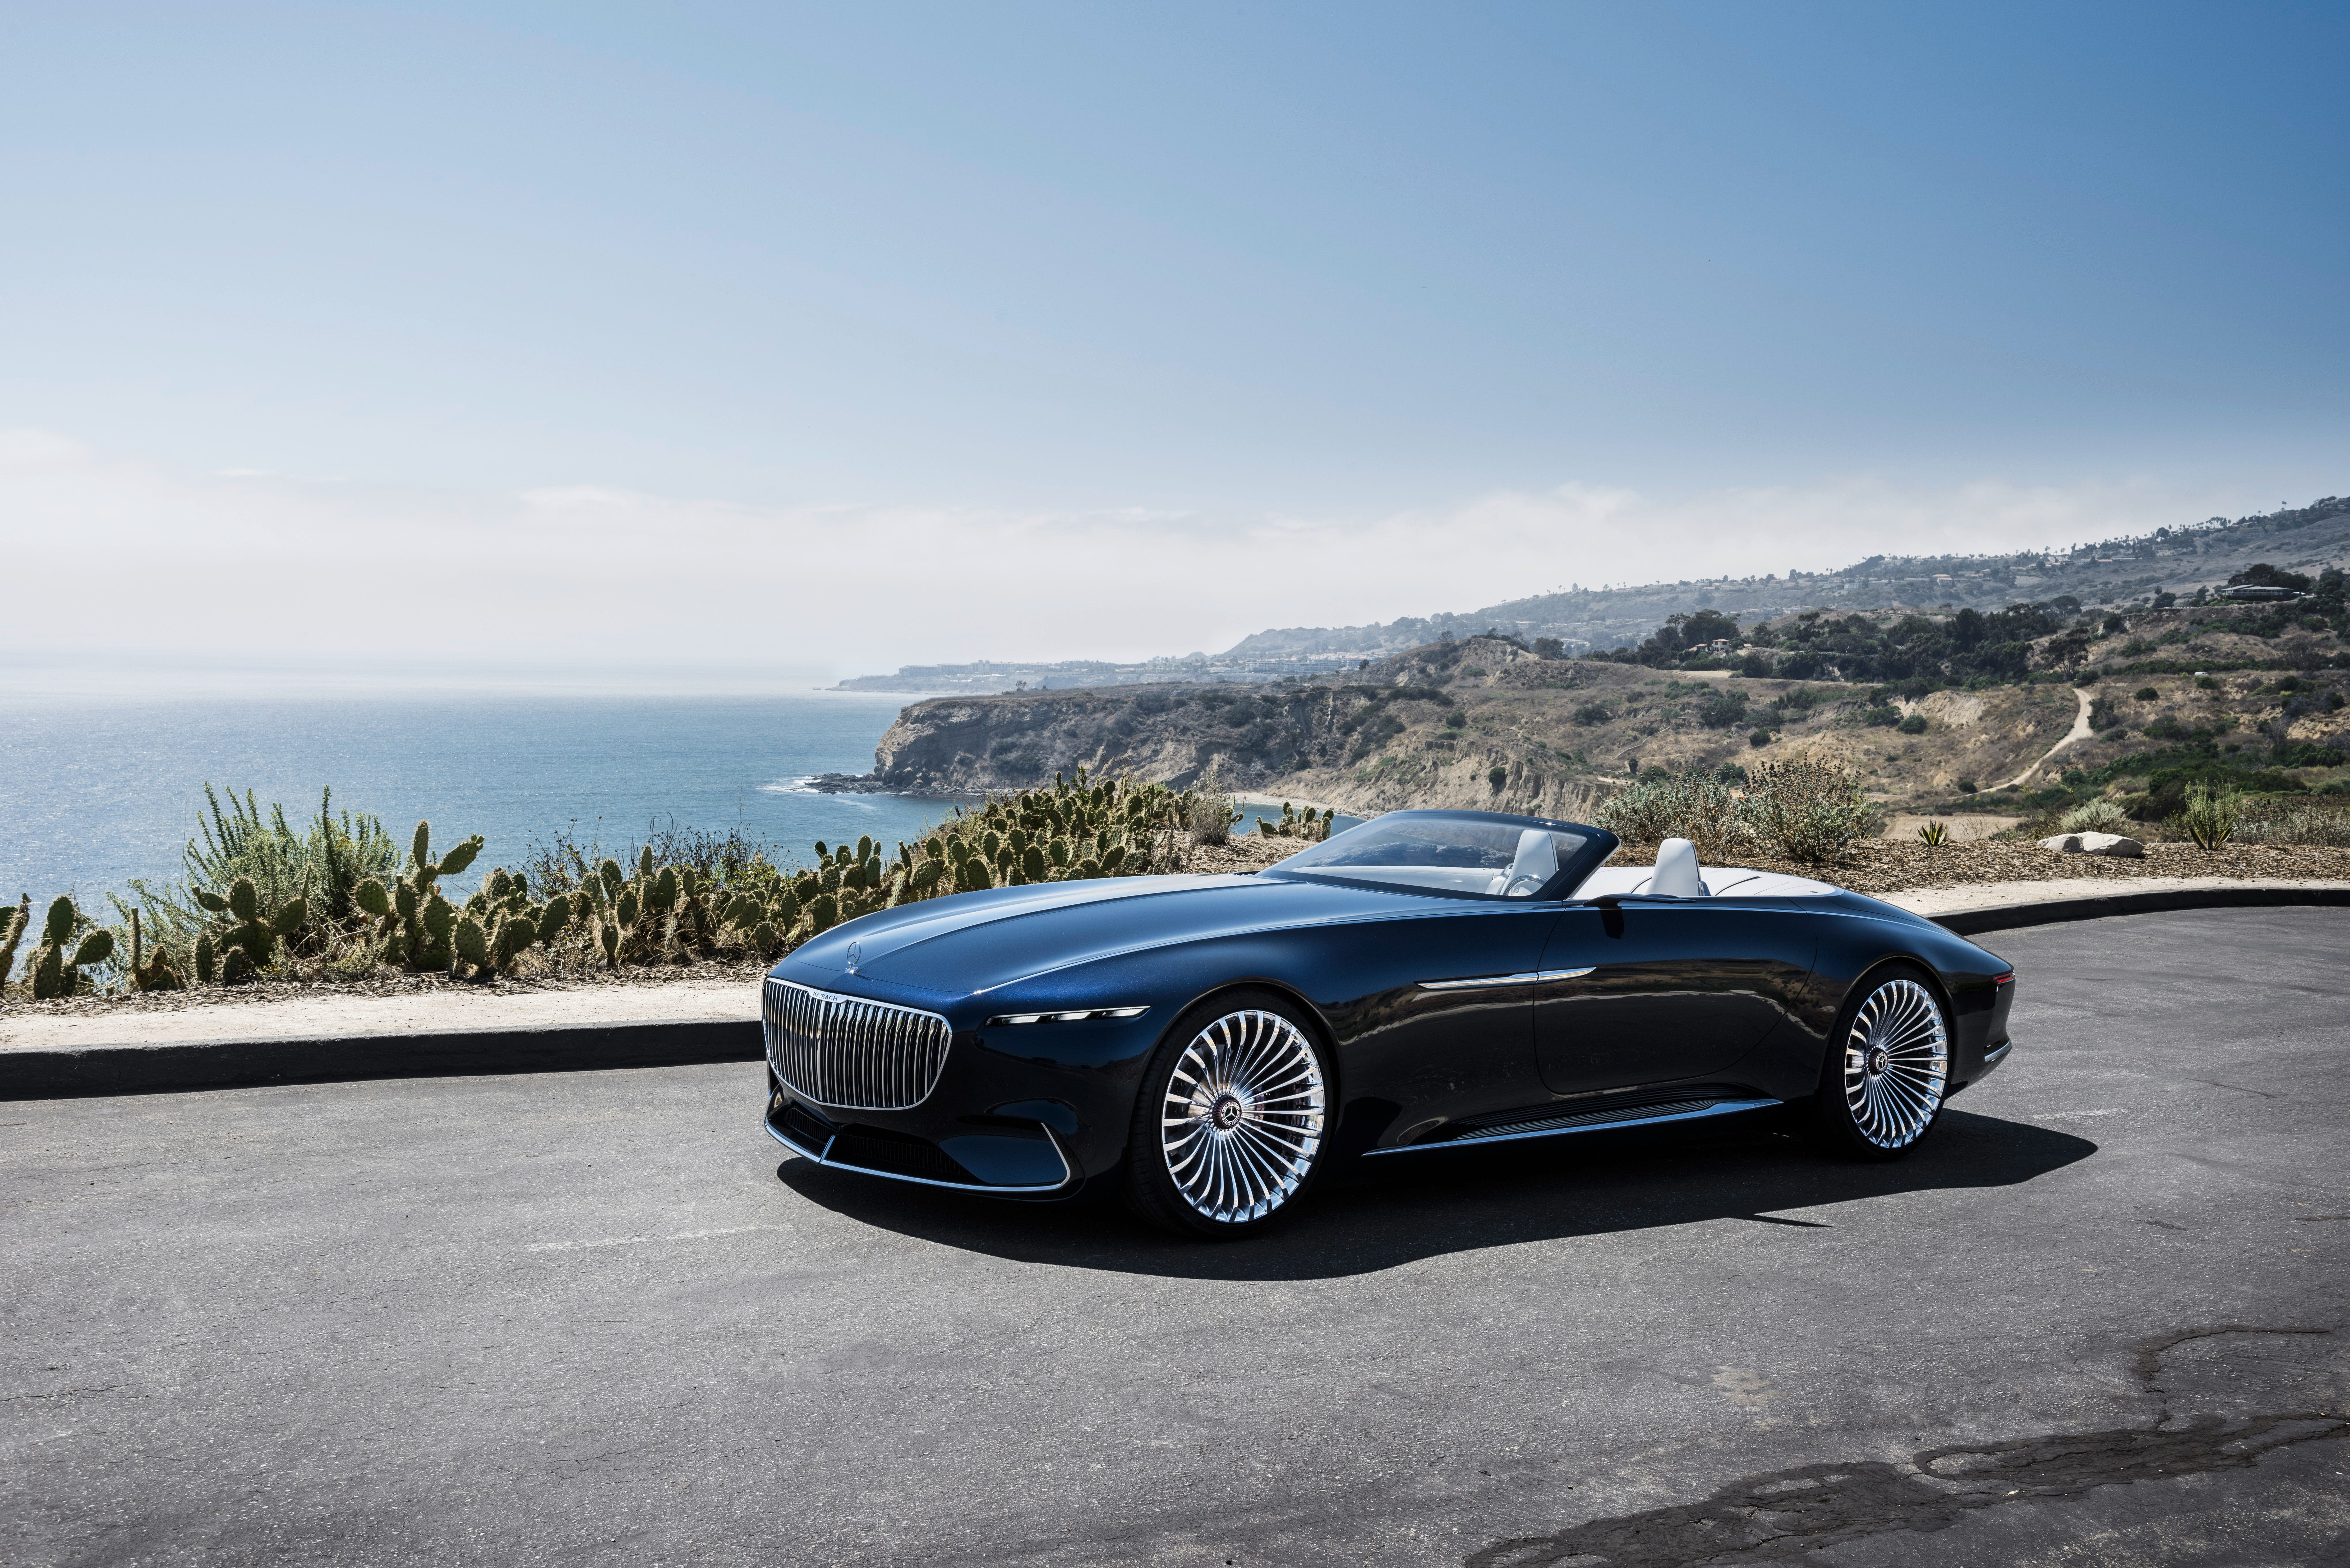 Mercedes concept cars